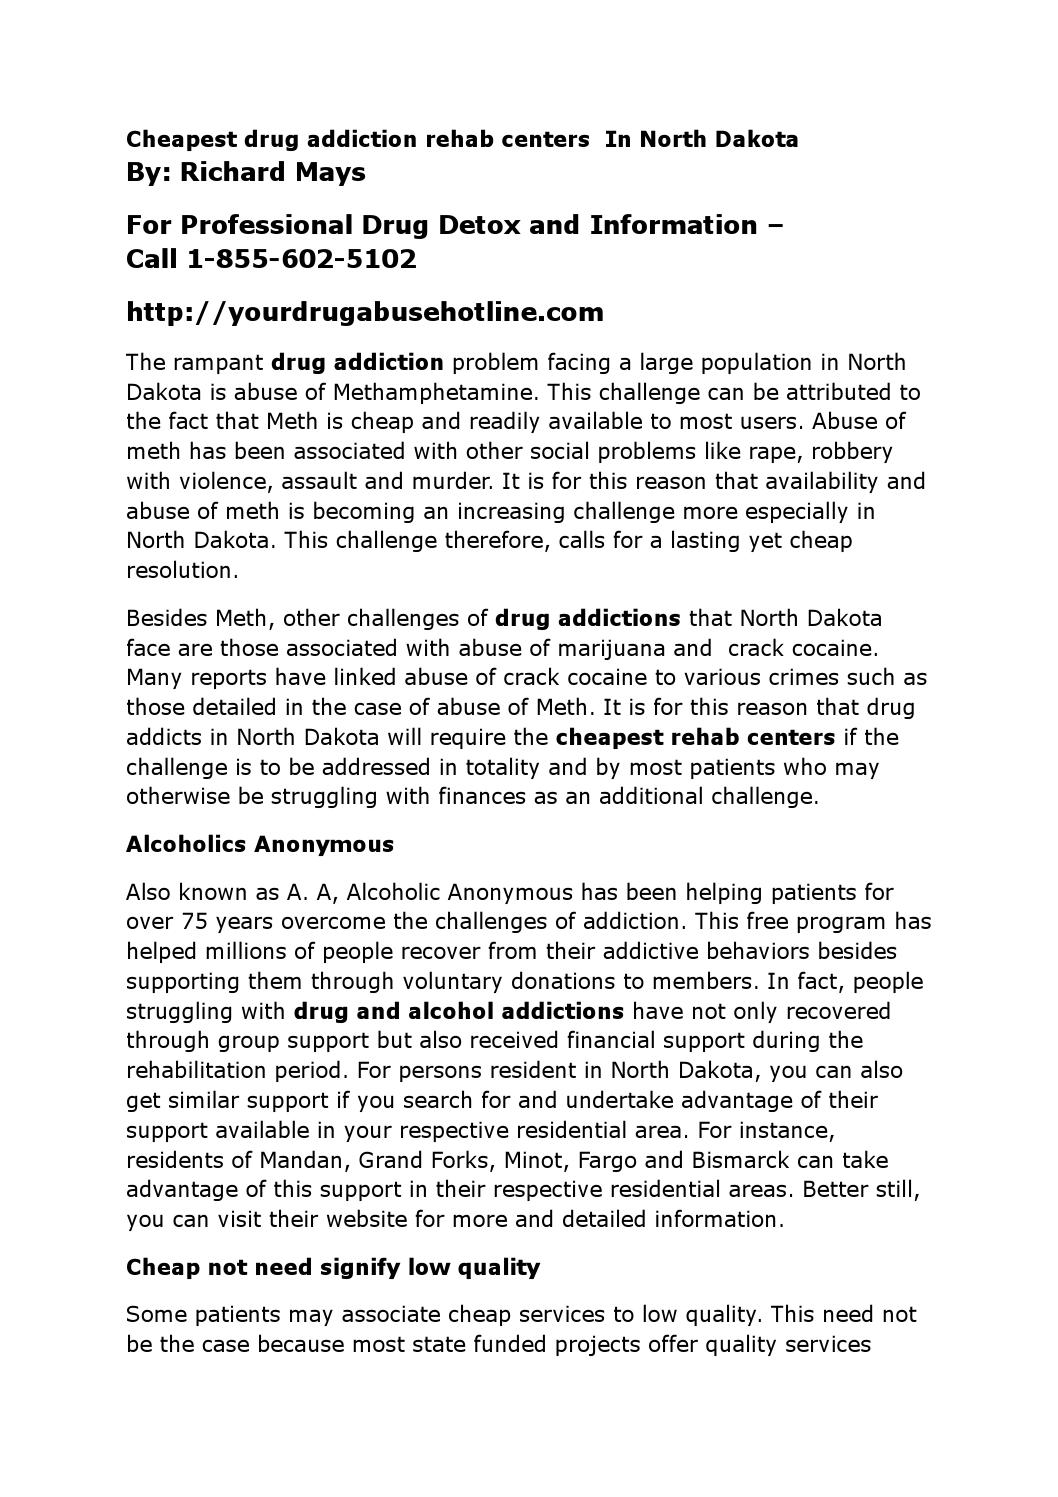 Cheapest drug addiction rehab centers in north dakota by NJSS - issuu